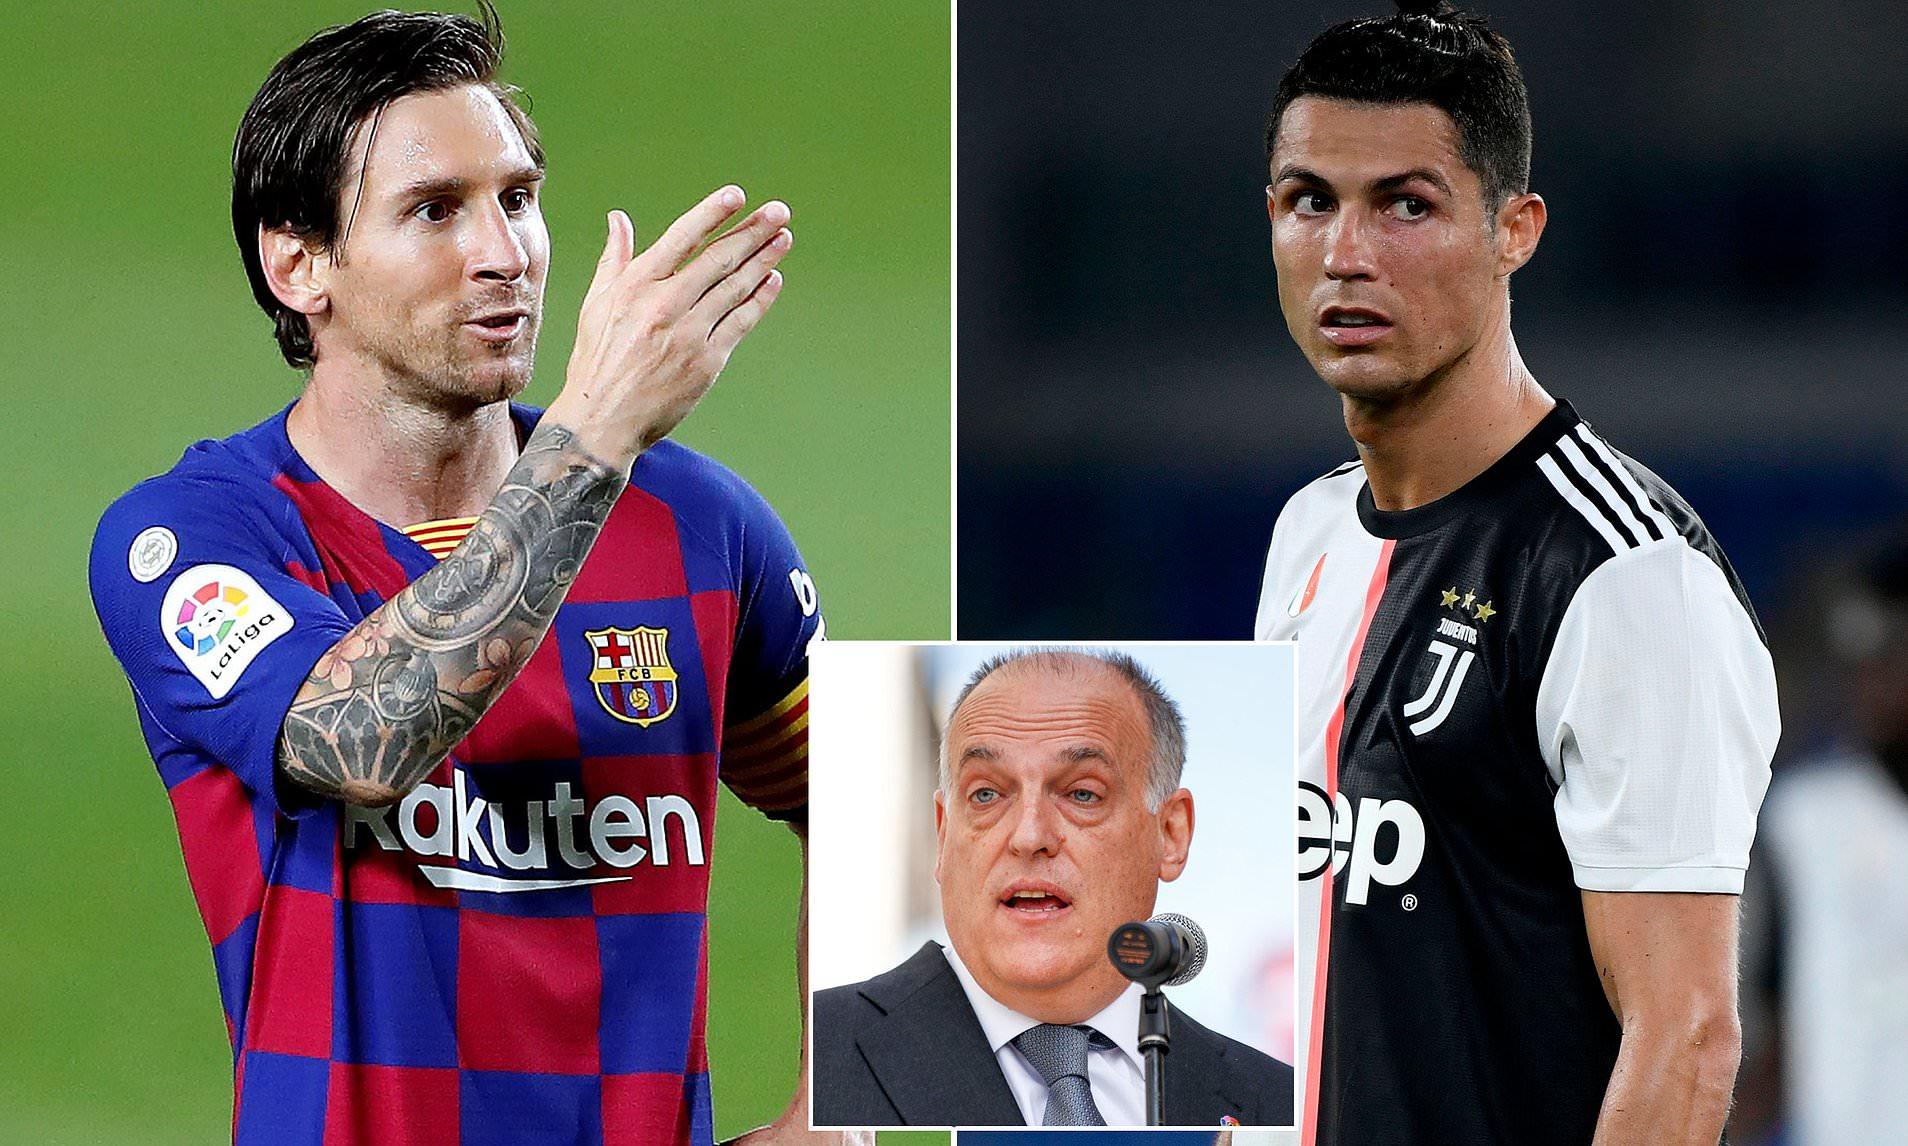 Cristiano Ronaldo Hasn't Improved Serie A Much, Says LaLiga President Javier Tebas - Bóng Đá